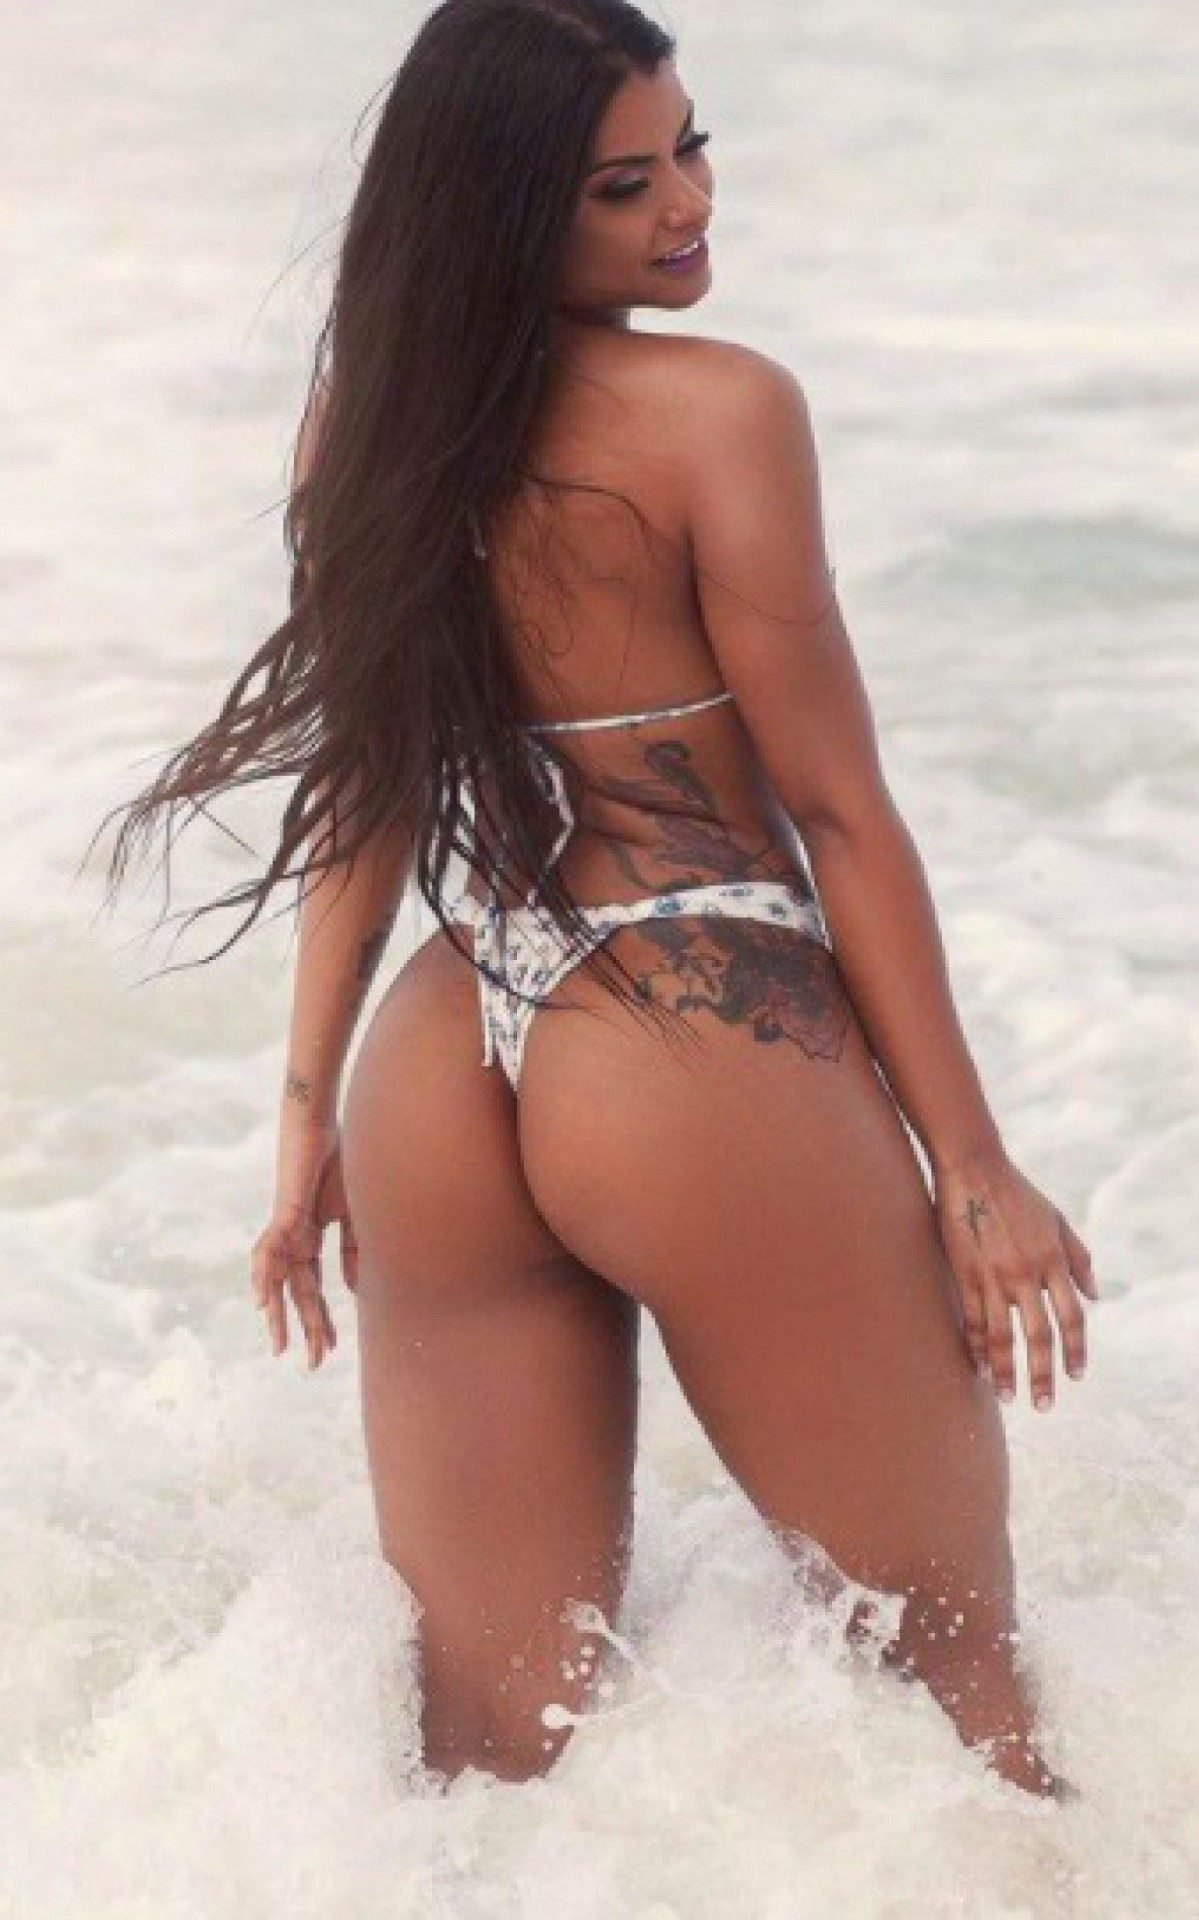 Carla Ranielly é nascida no Ceará